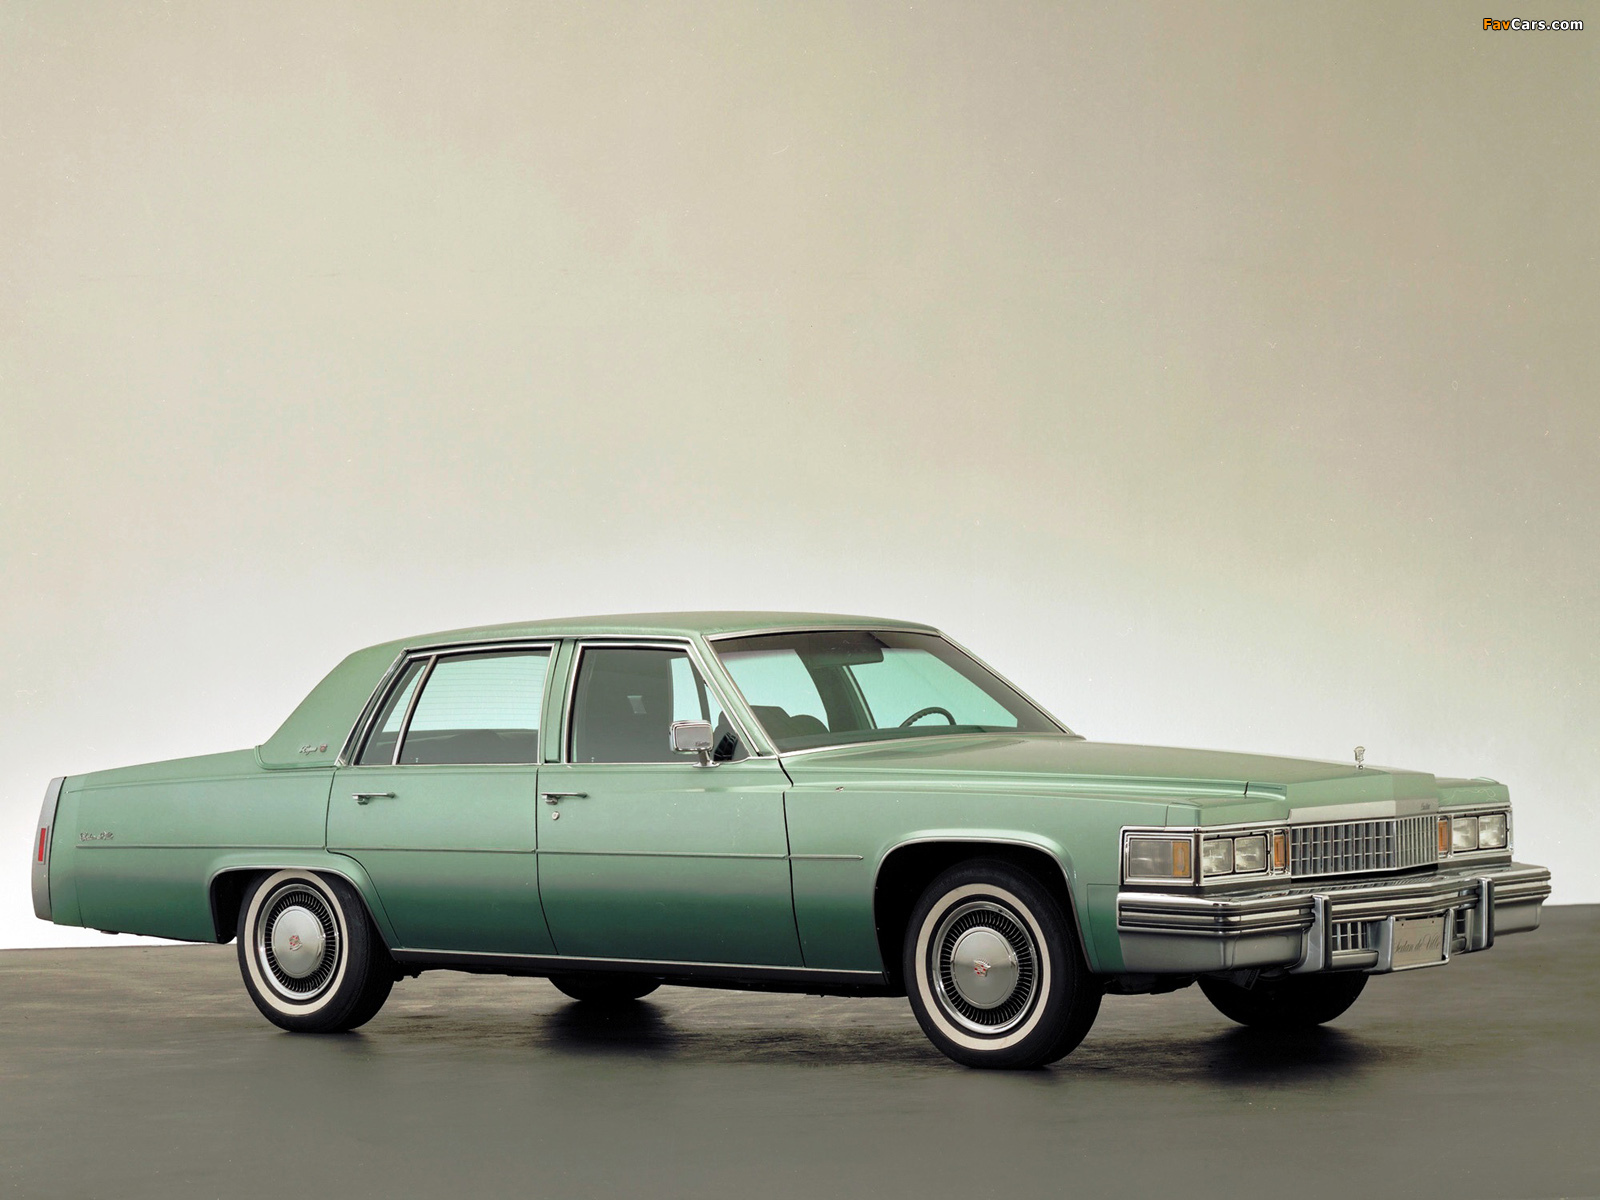 Cadillac Sedan de Ville 1978 wallpapers (1600 x 1200)